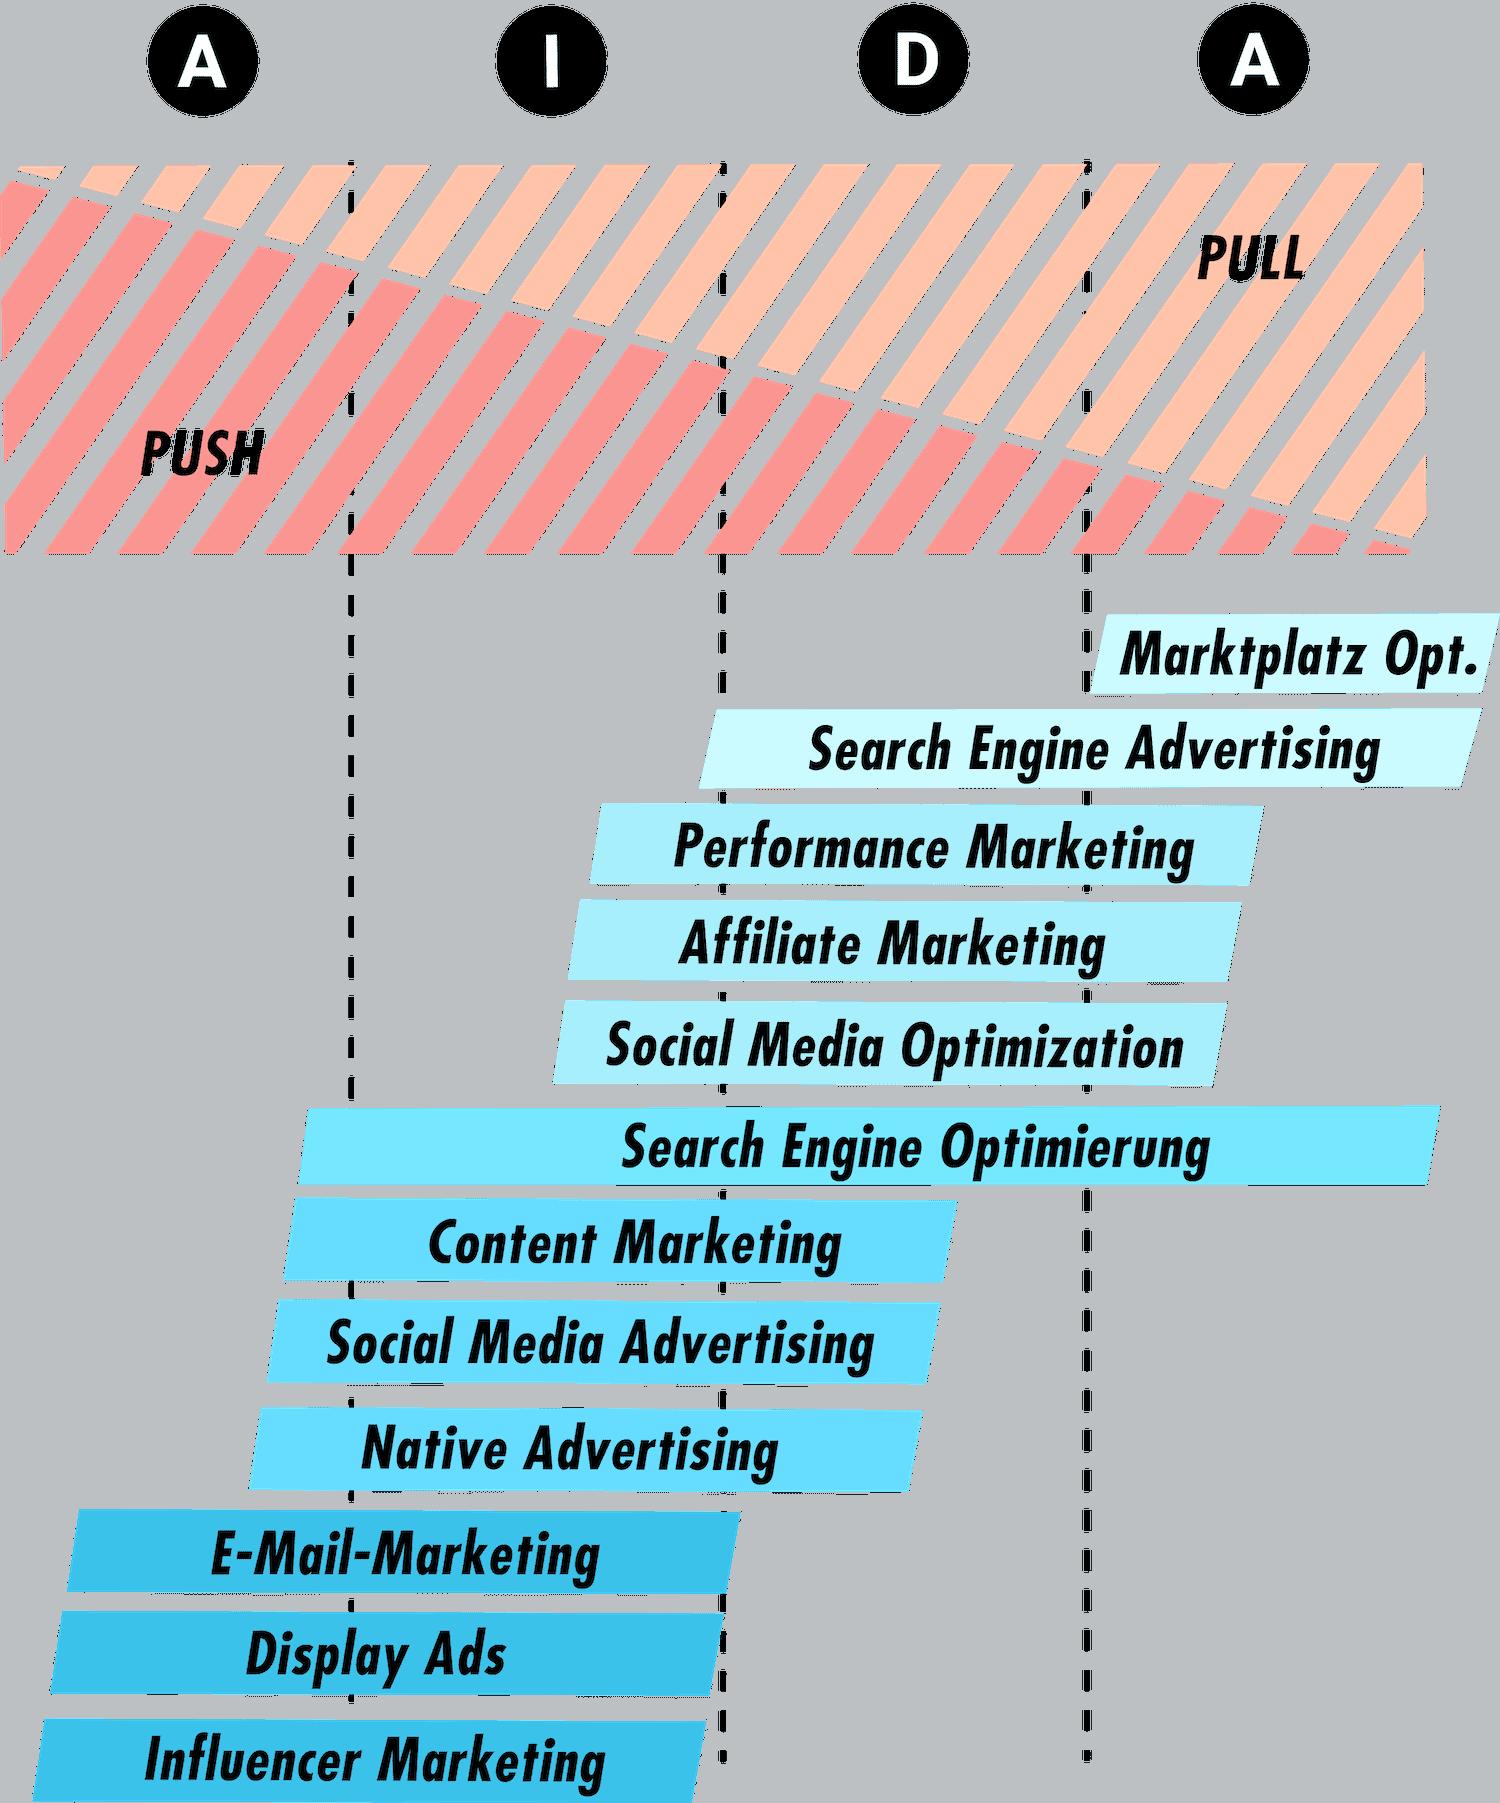 AIDA Funnel Online Marketing huks Push Pull